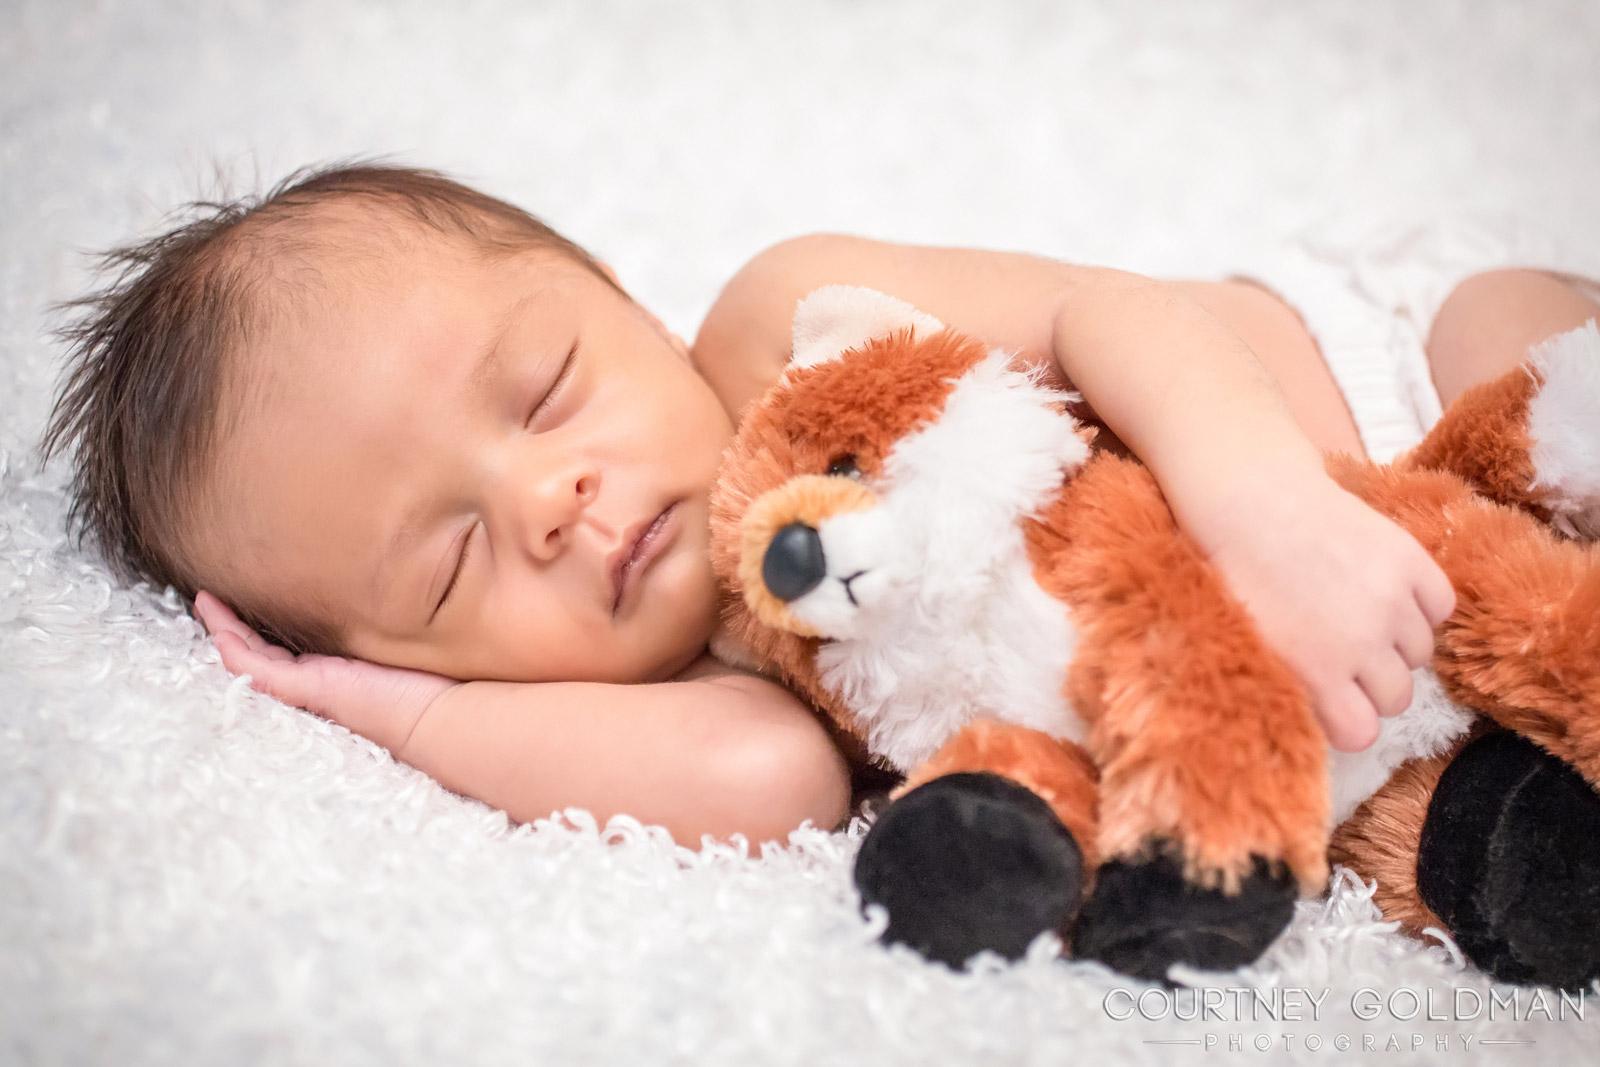 Atlanta Maternity and Newborn Photography by Courtney Goldman 24.jpg